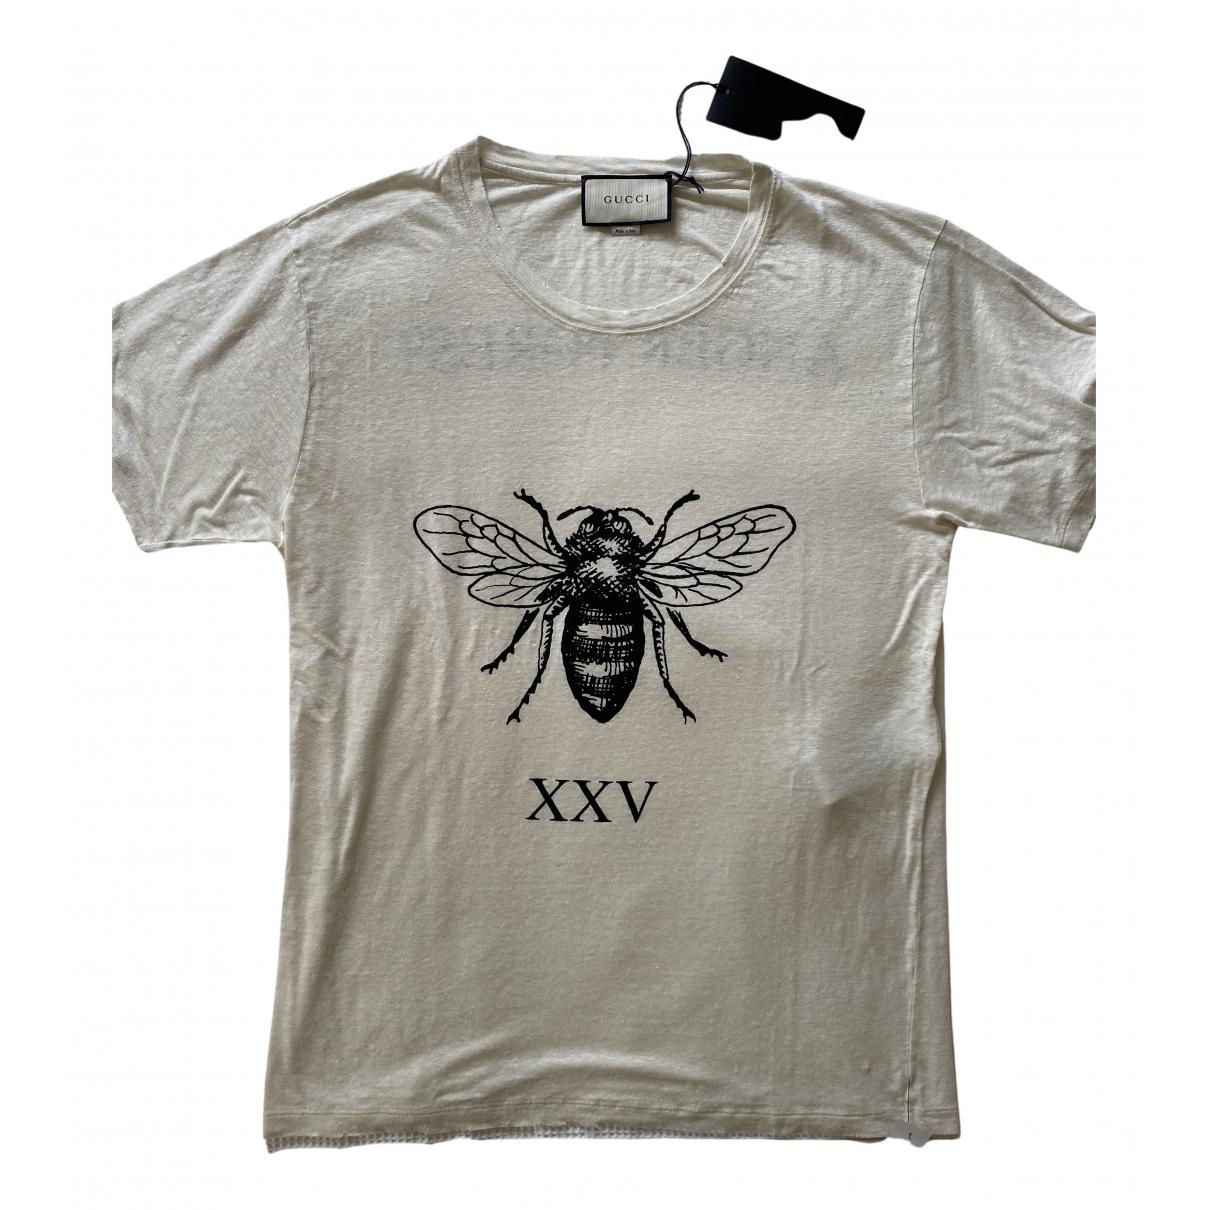 Gucci - Tee shirts   pour homme en lin - blanc